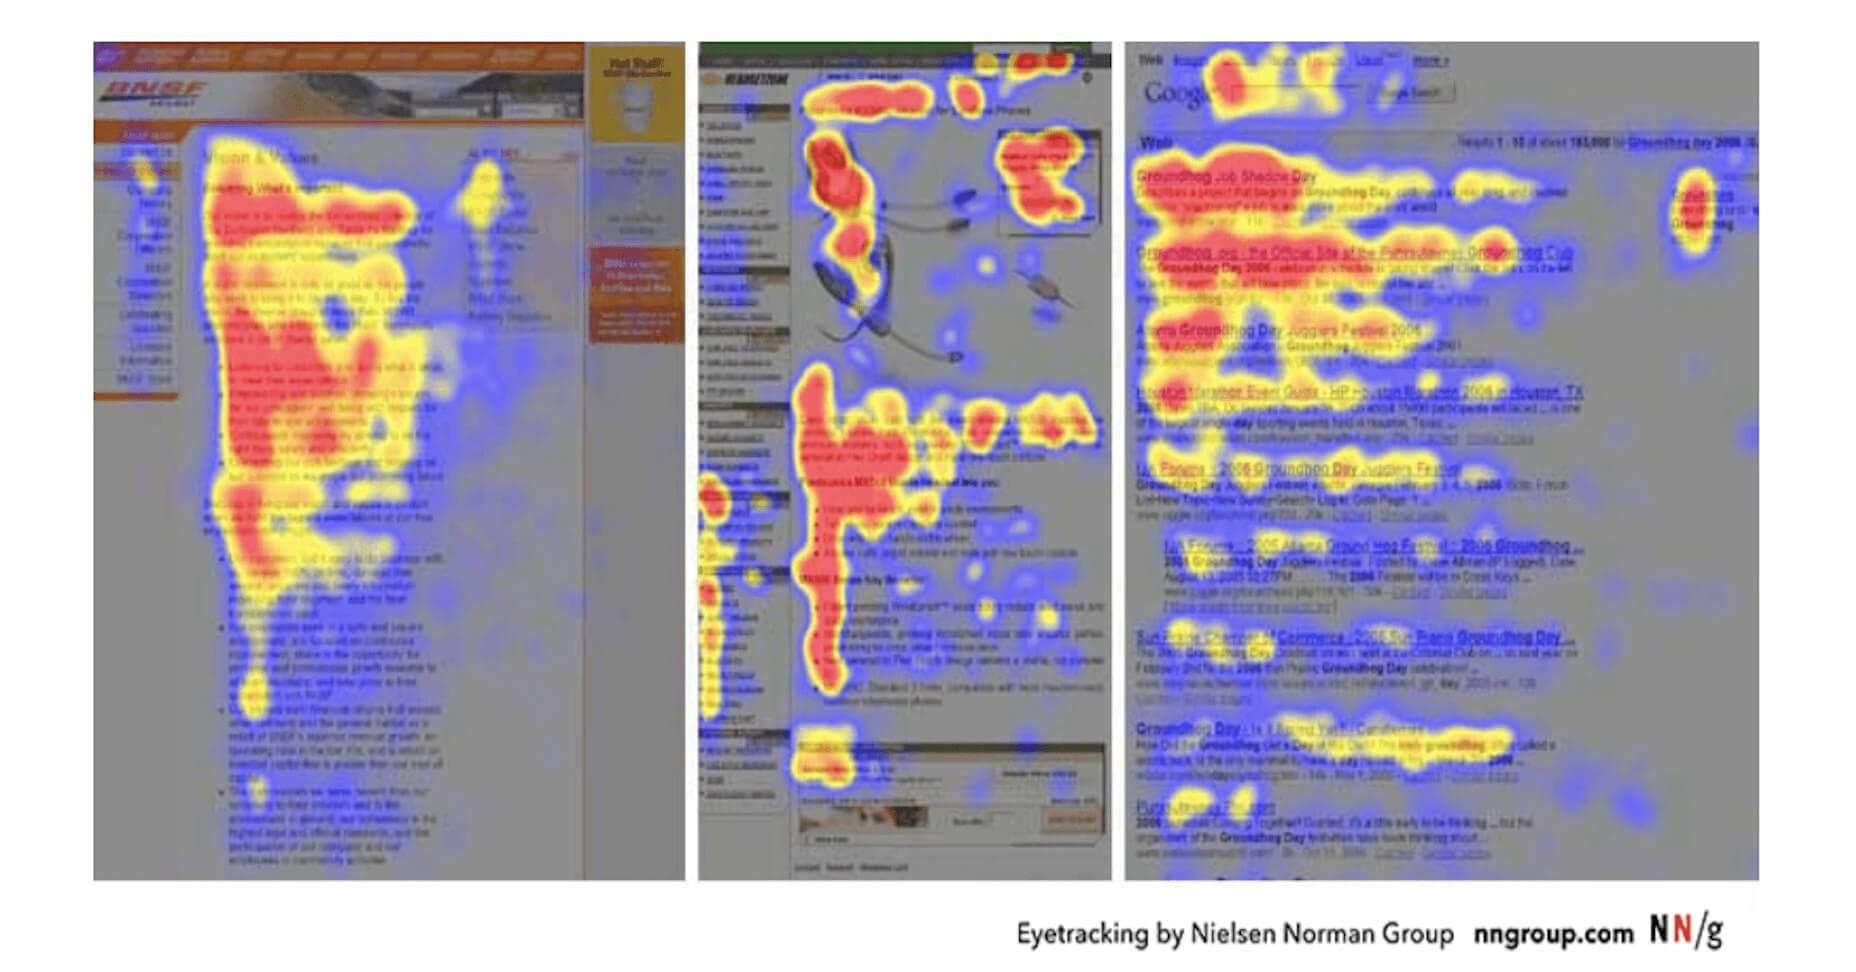 eye-tracking-heatmaps-neurowebdesign